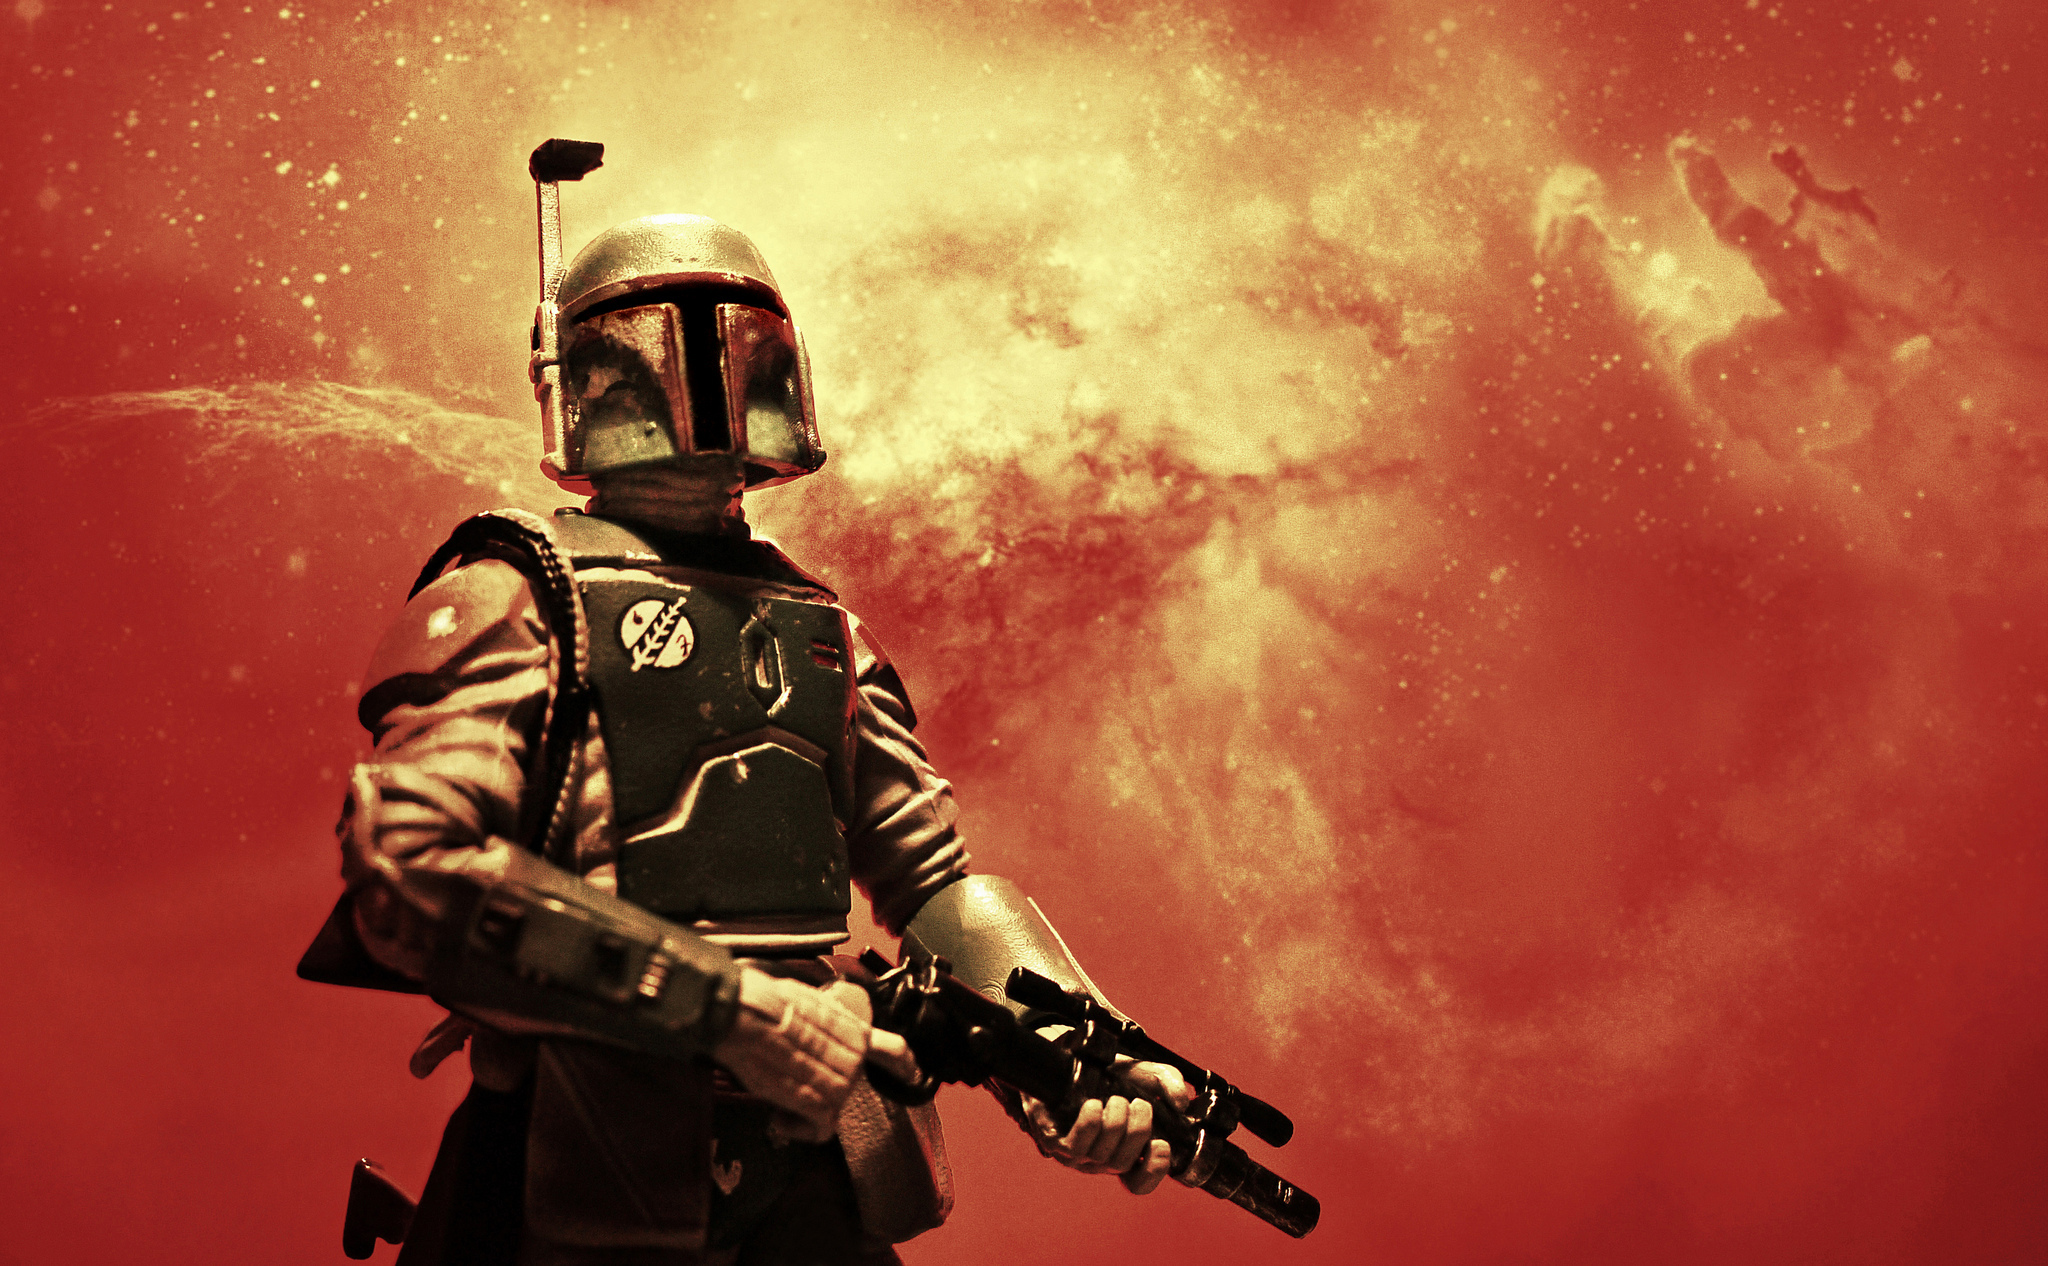 Star Wars The Empire Strikes Back The Black Series Figurine Hd